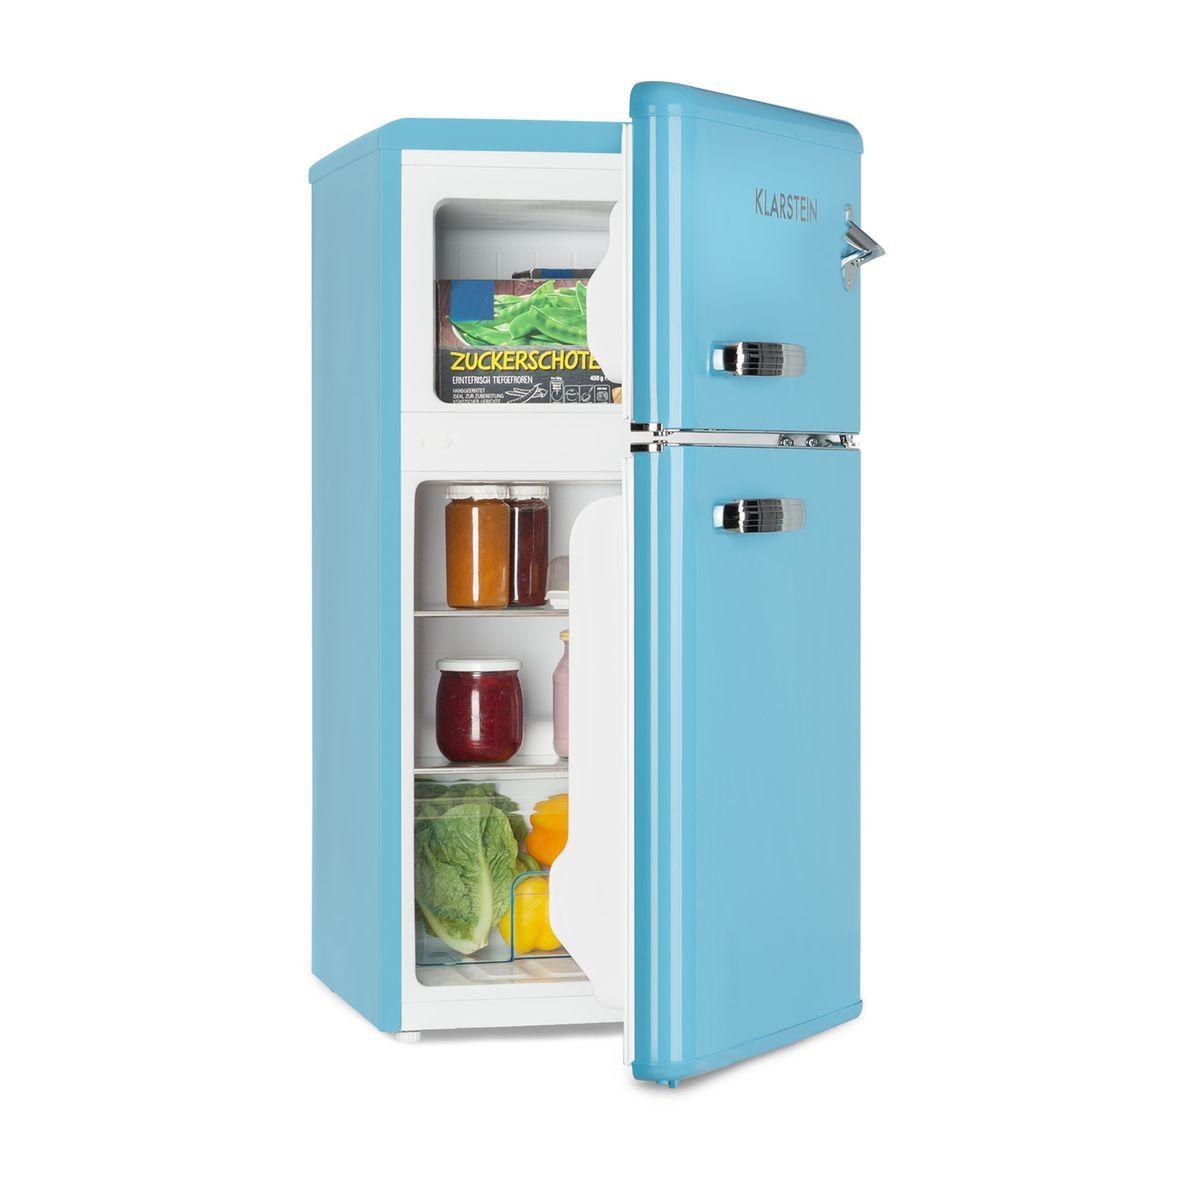 Refrigerateur Congelateur Irene Refrigerateur Congelateur Refrigerateur Espaces De Stockage